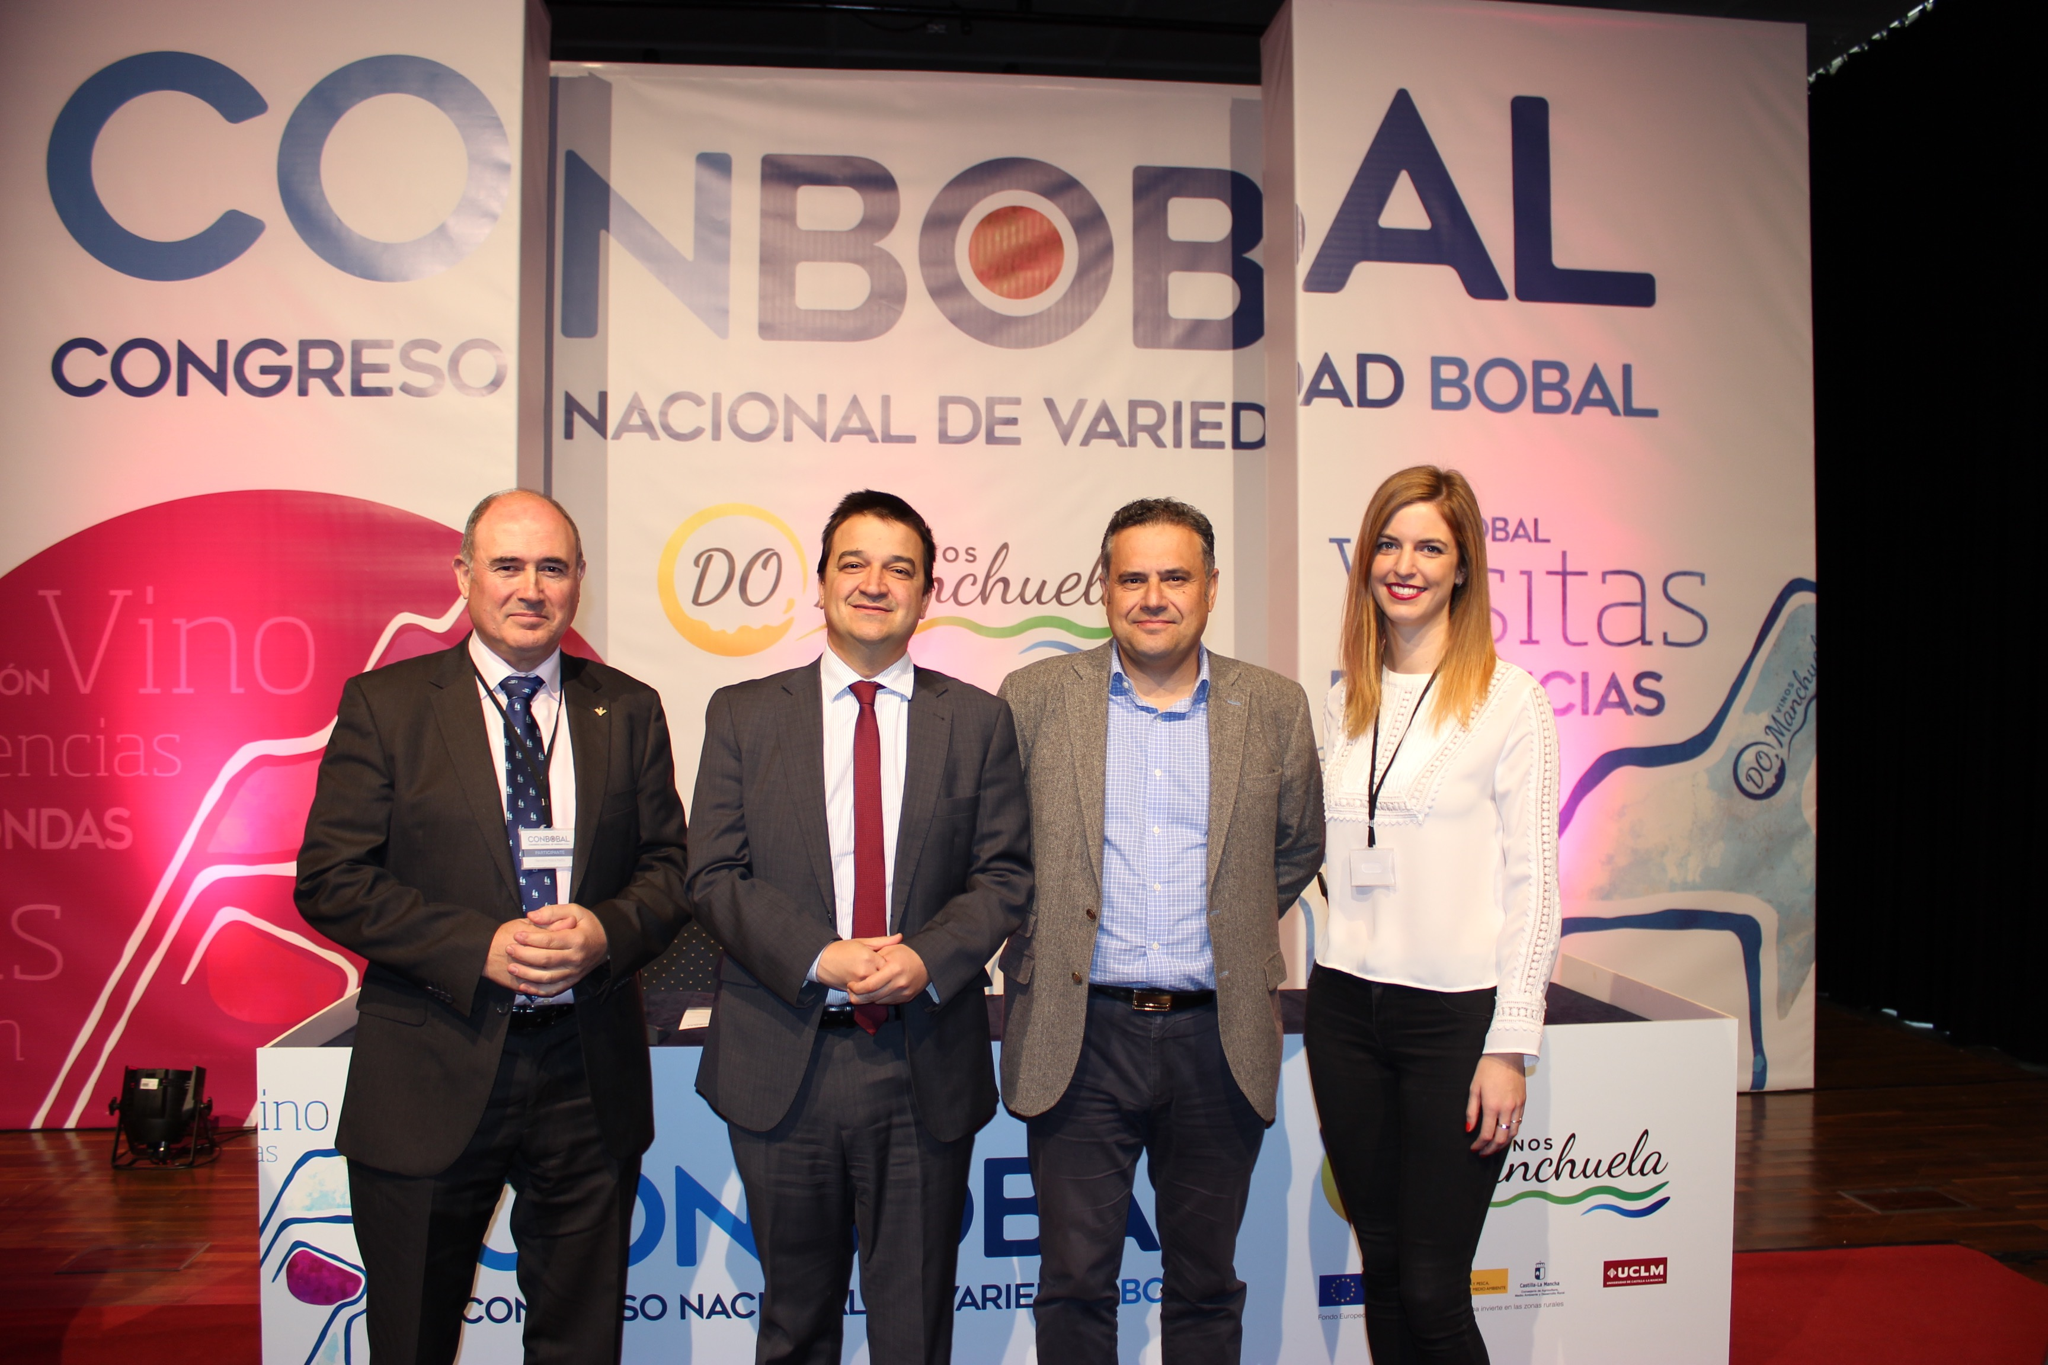 https://blog.globalcaja.es/wp-content/uploads/2017/11/Globalcaja-en-el-Congreso-Nacional-de-Variedad-Bobal.jpg